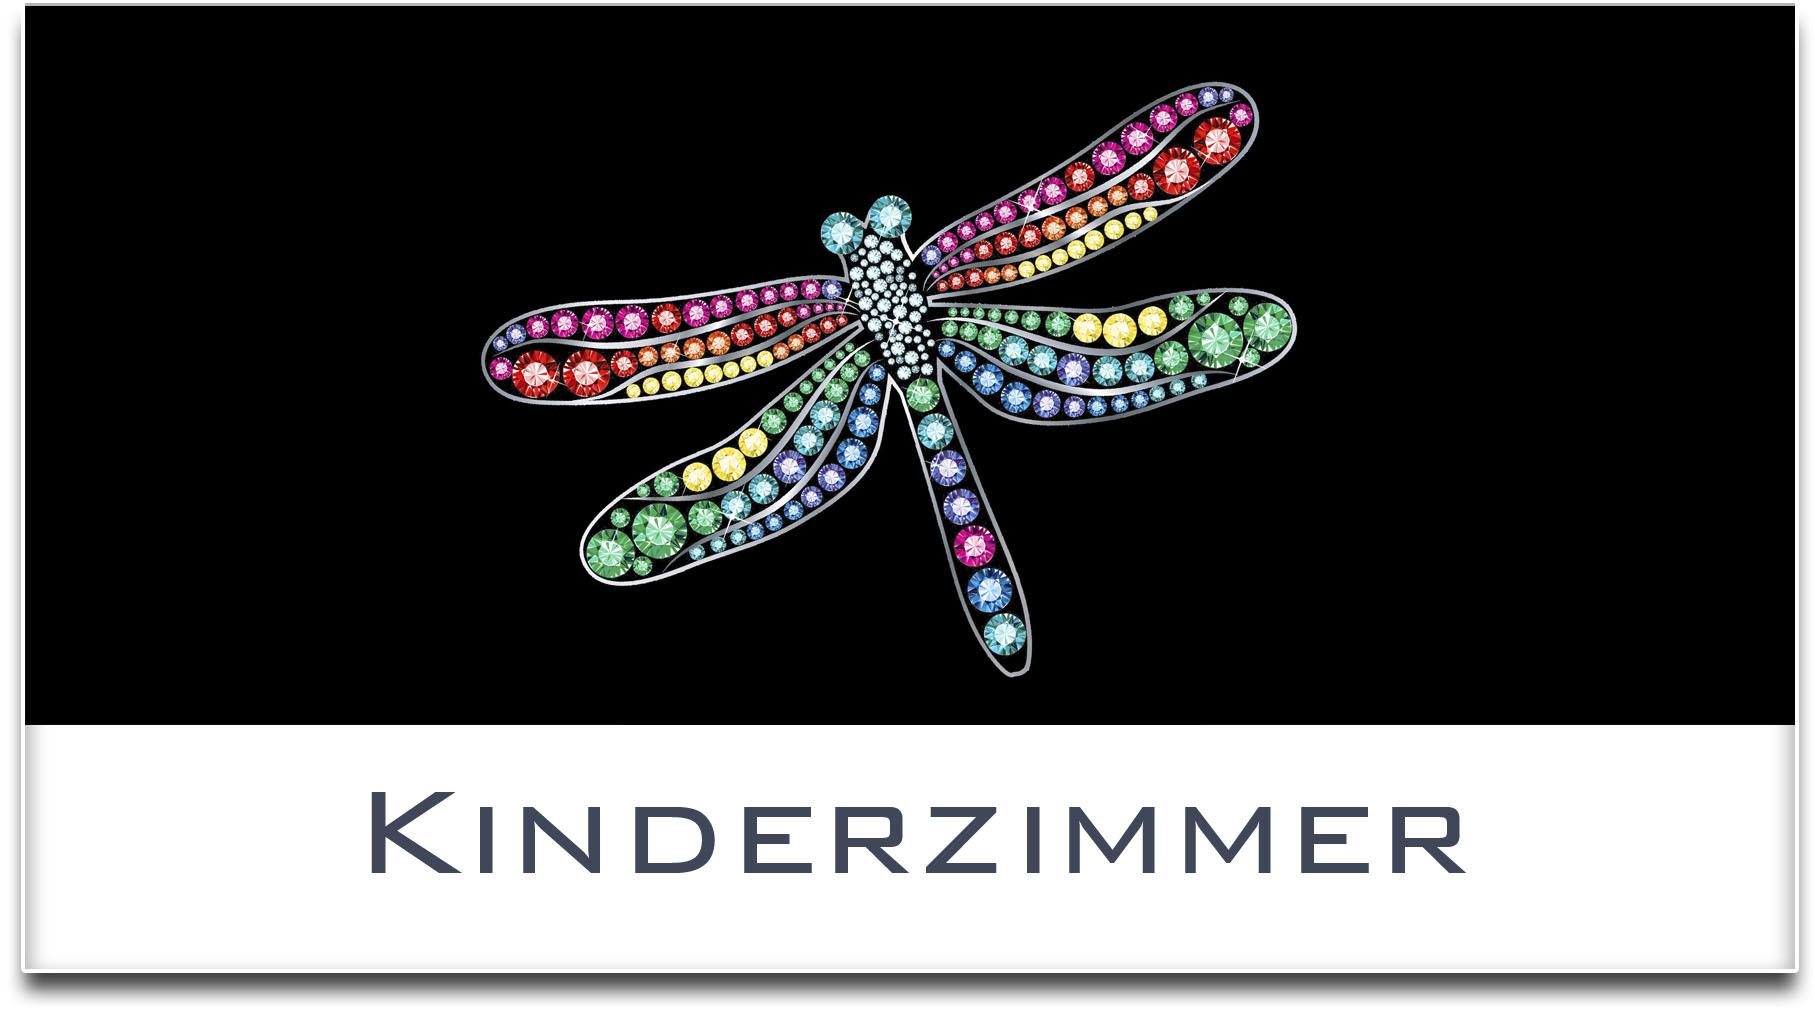 Türschild / Haustürschild / Libelle / Kinderzimmer / Selbstklebend